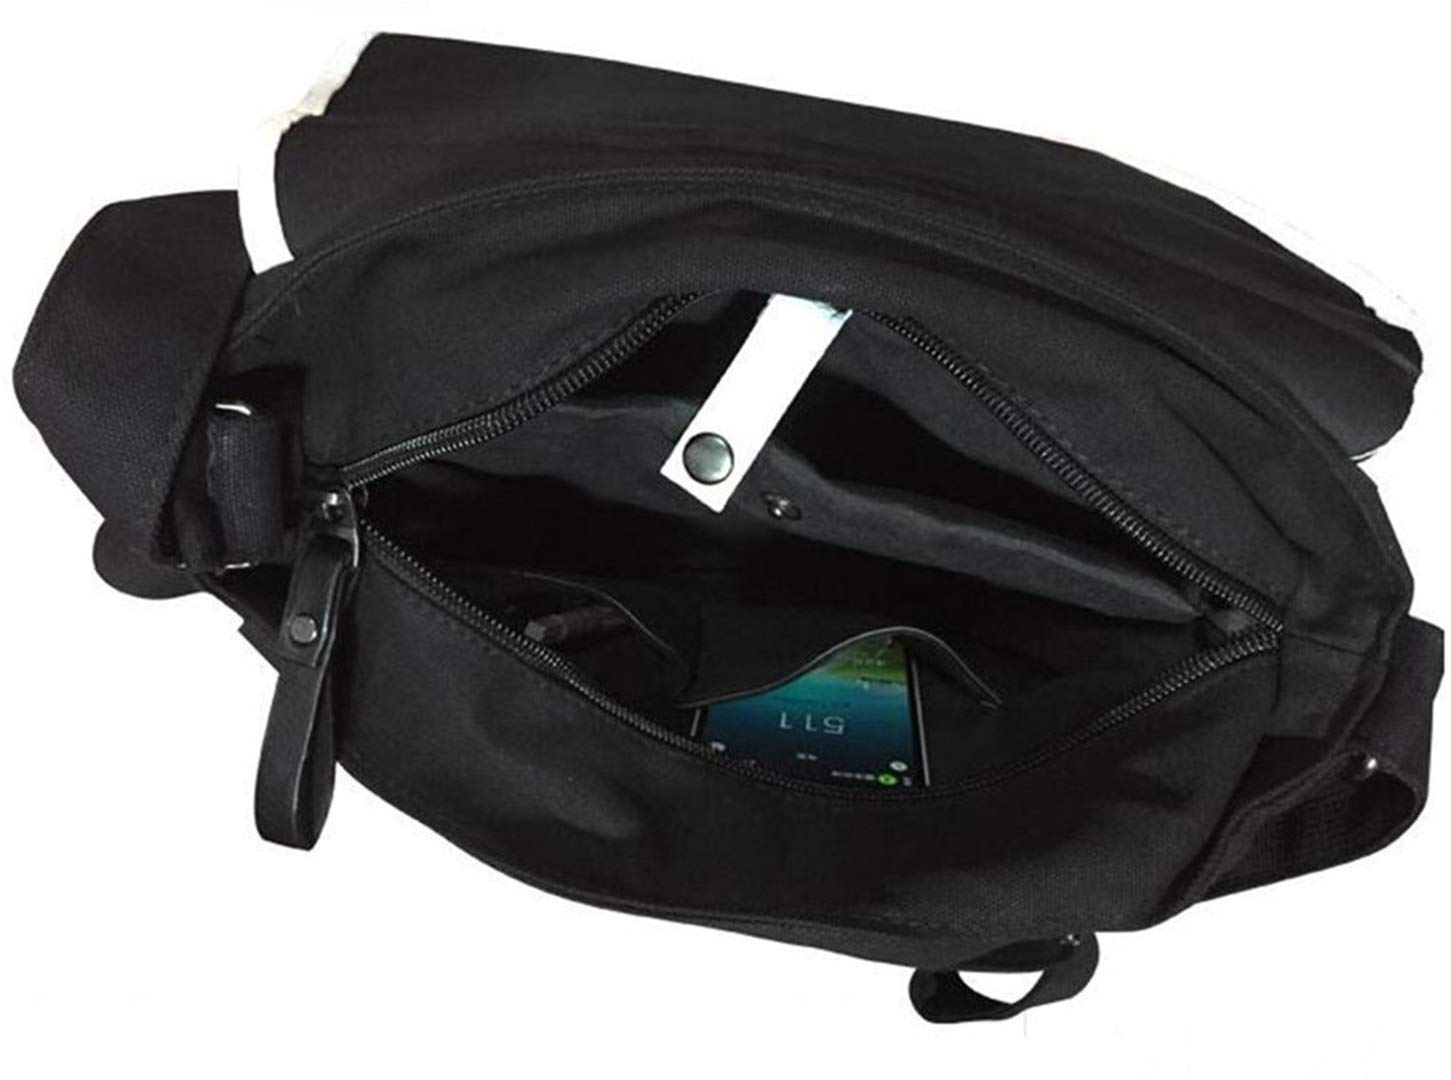 AUGYUESS Game of Thrones Crossbody Messenger Bag Handbag Tote Bag Shoulder Bag